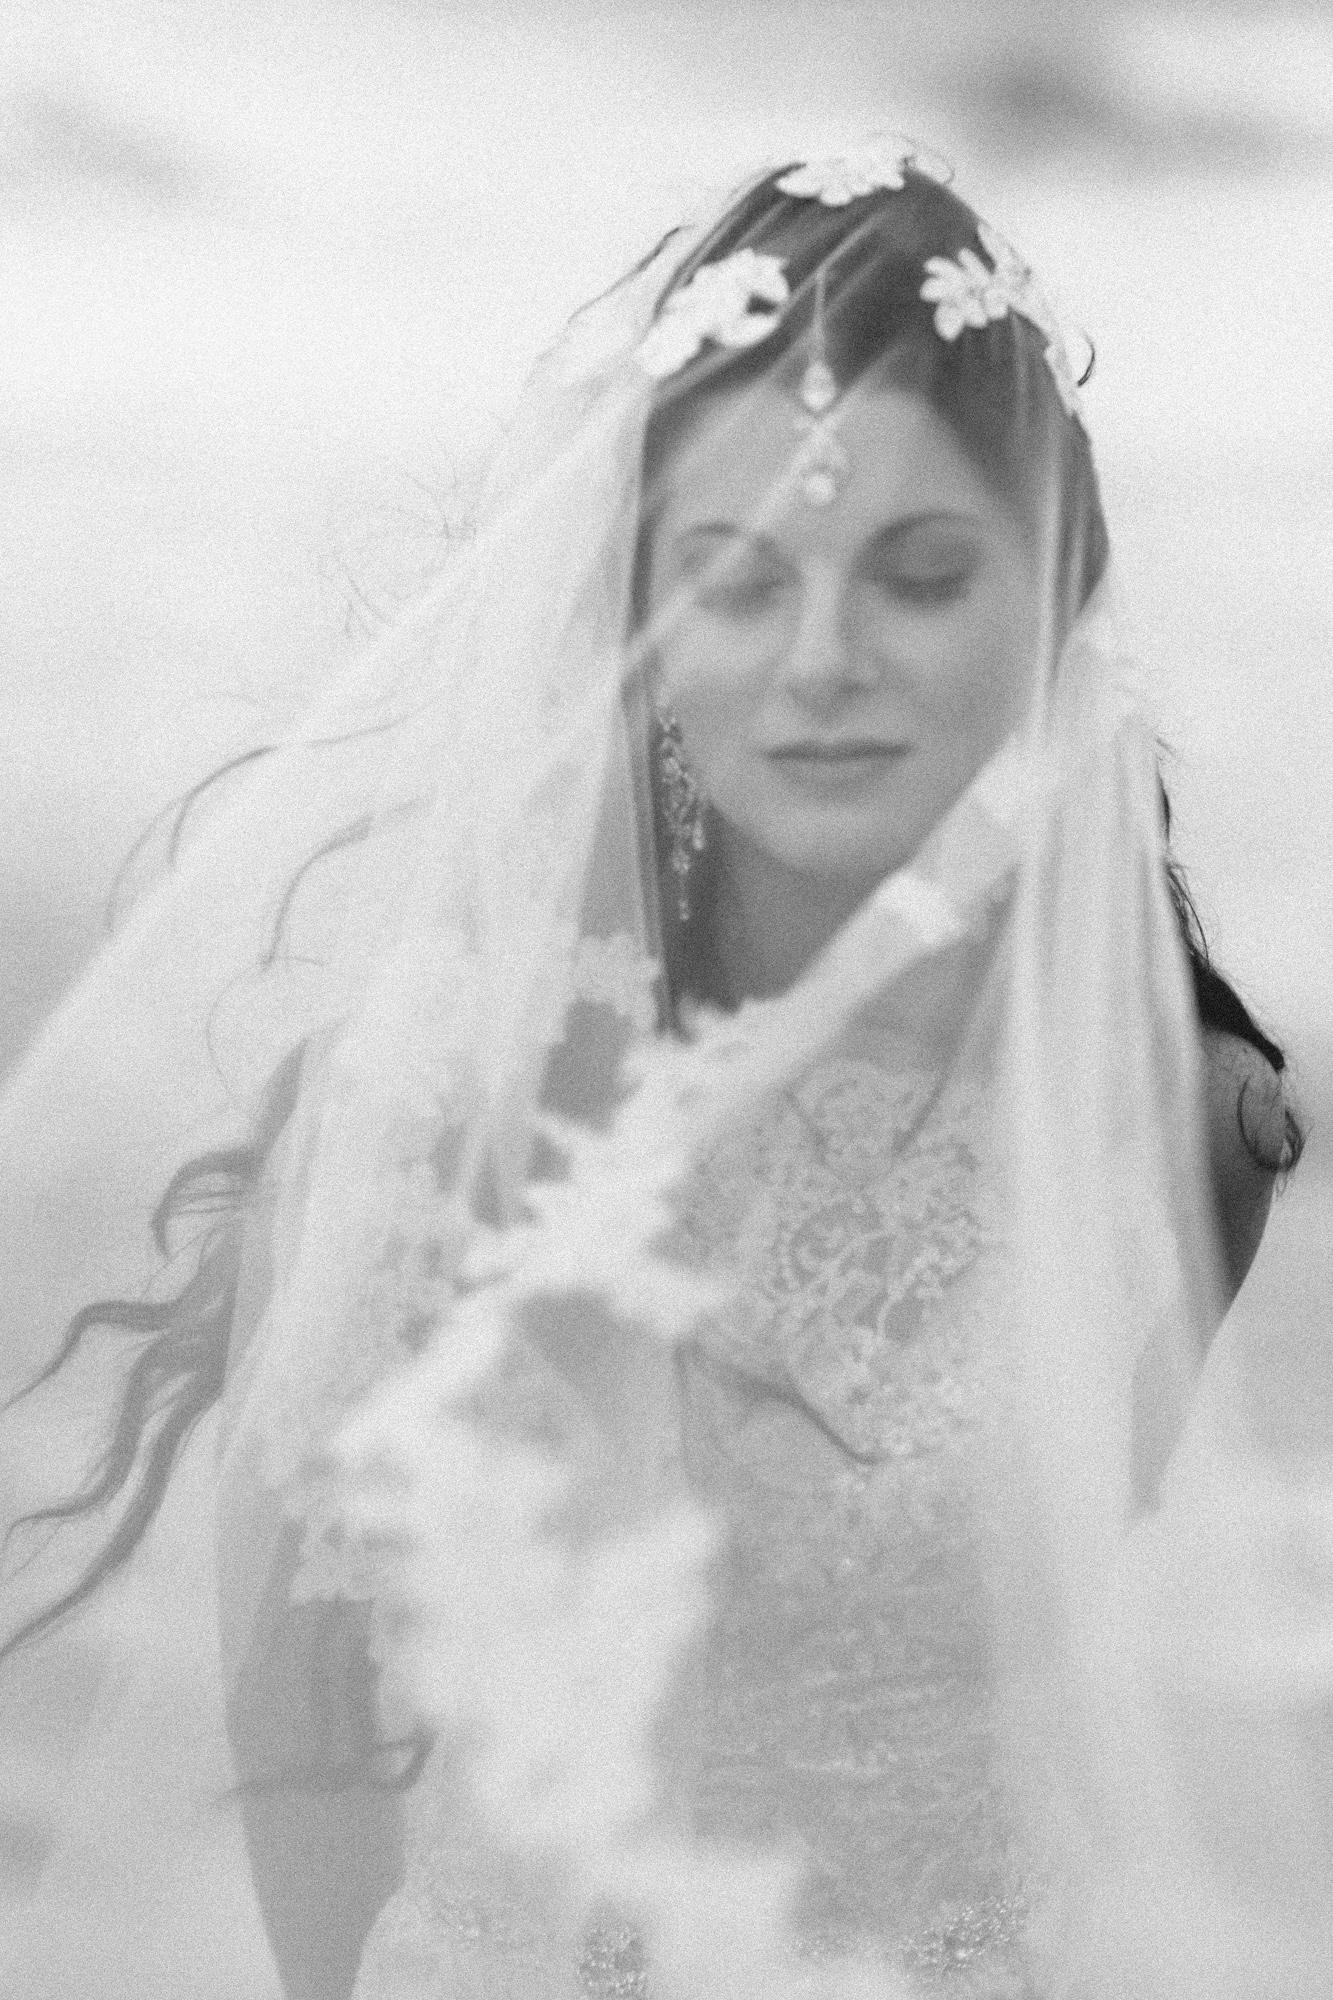 Puerto Rico Wedding Photography Destination Photographer Boris Zaretsky San Juan PR Casino Antiguo La Concha _B2C7436-2.jpg